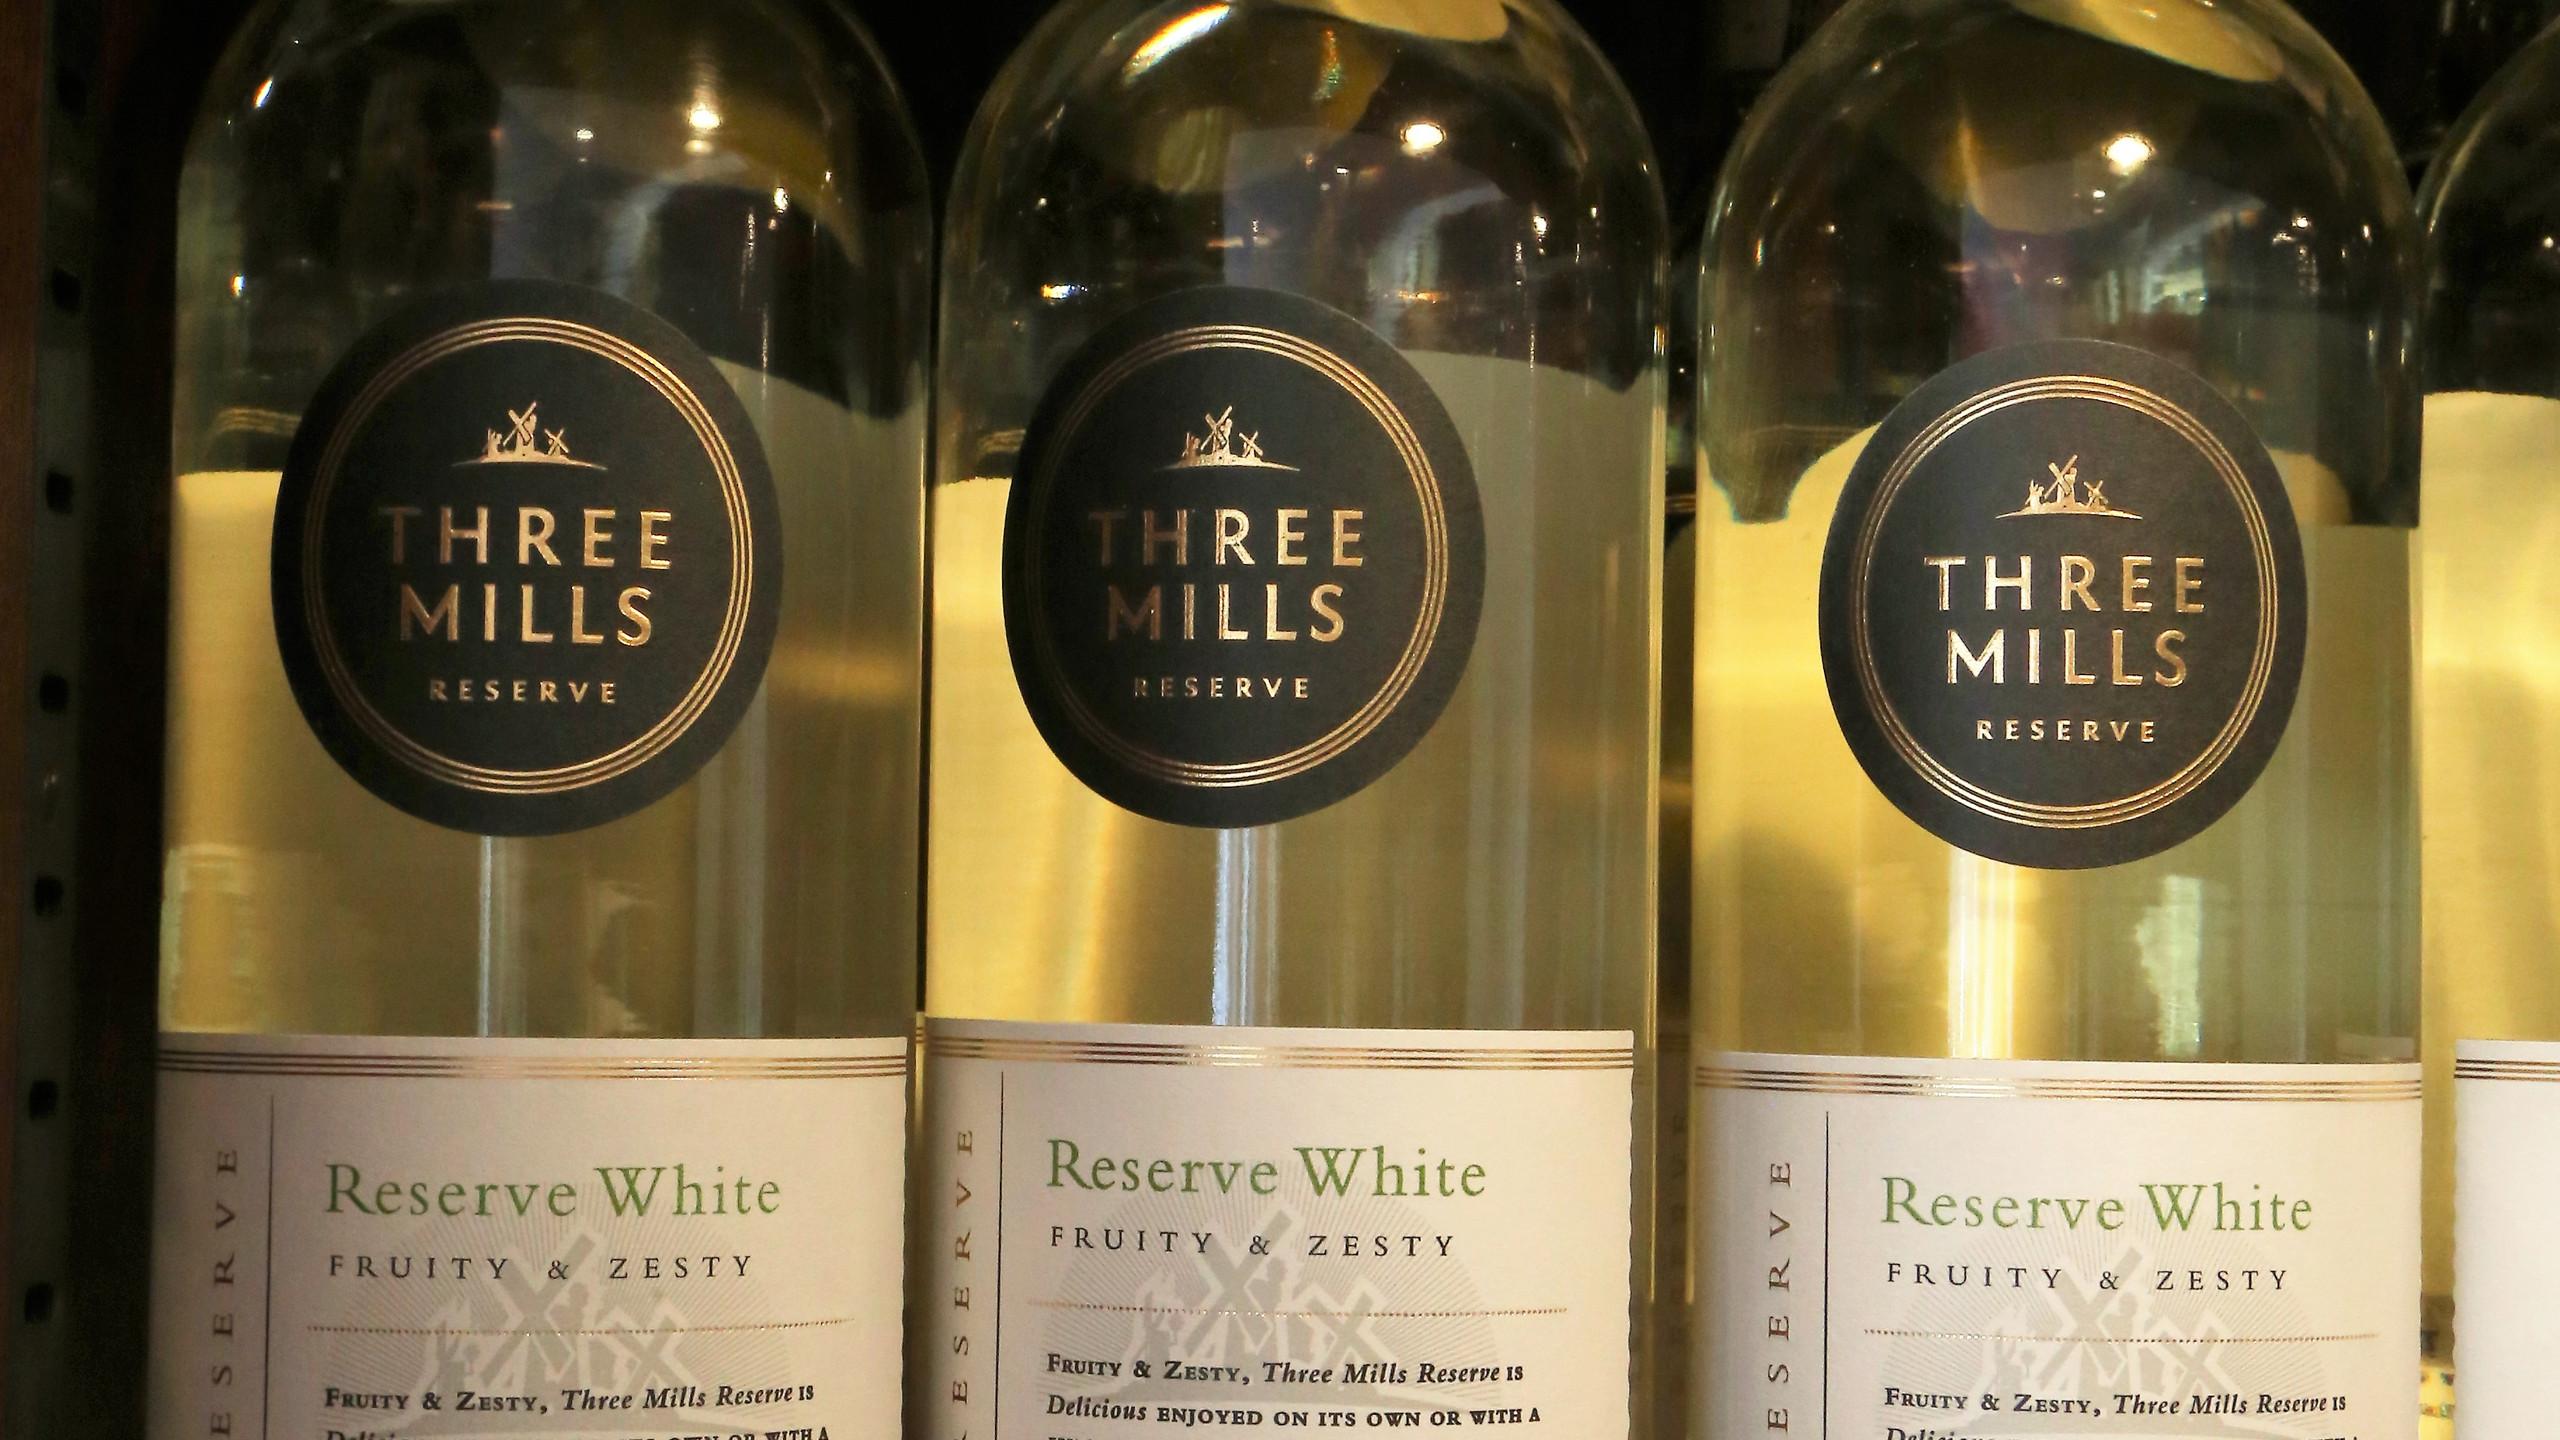 Three Mills white reserve